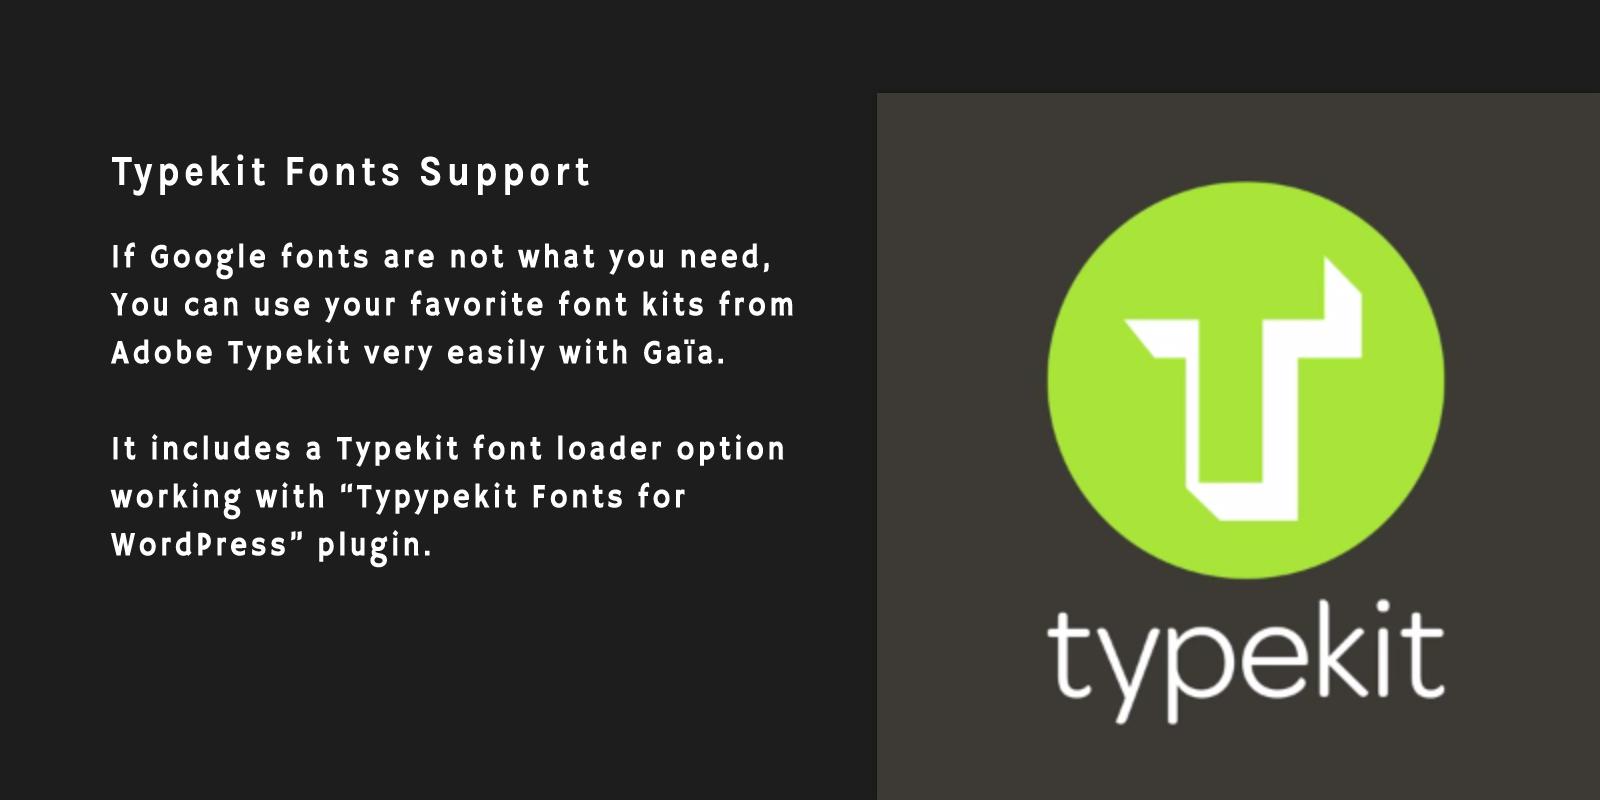 Typekit Fonts